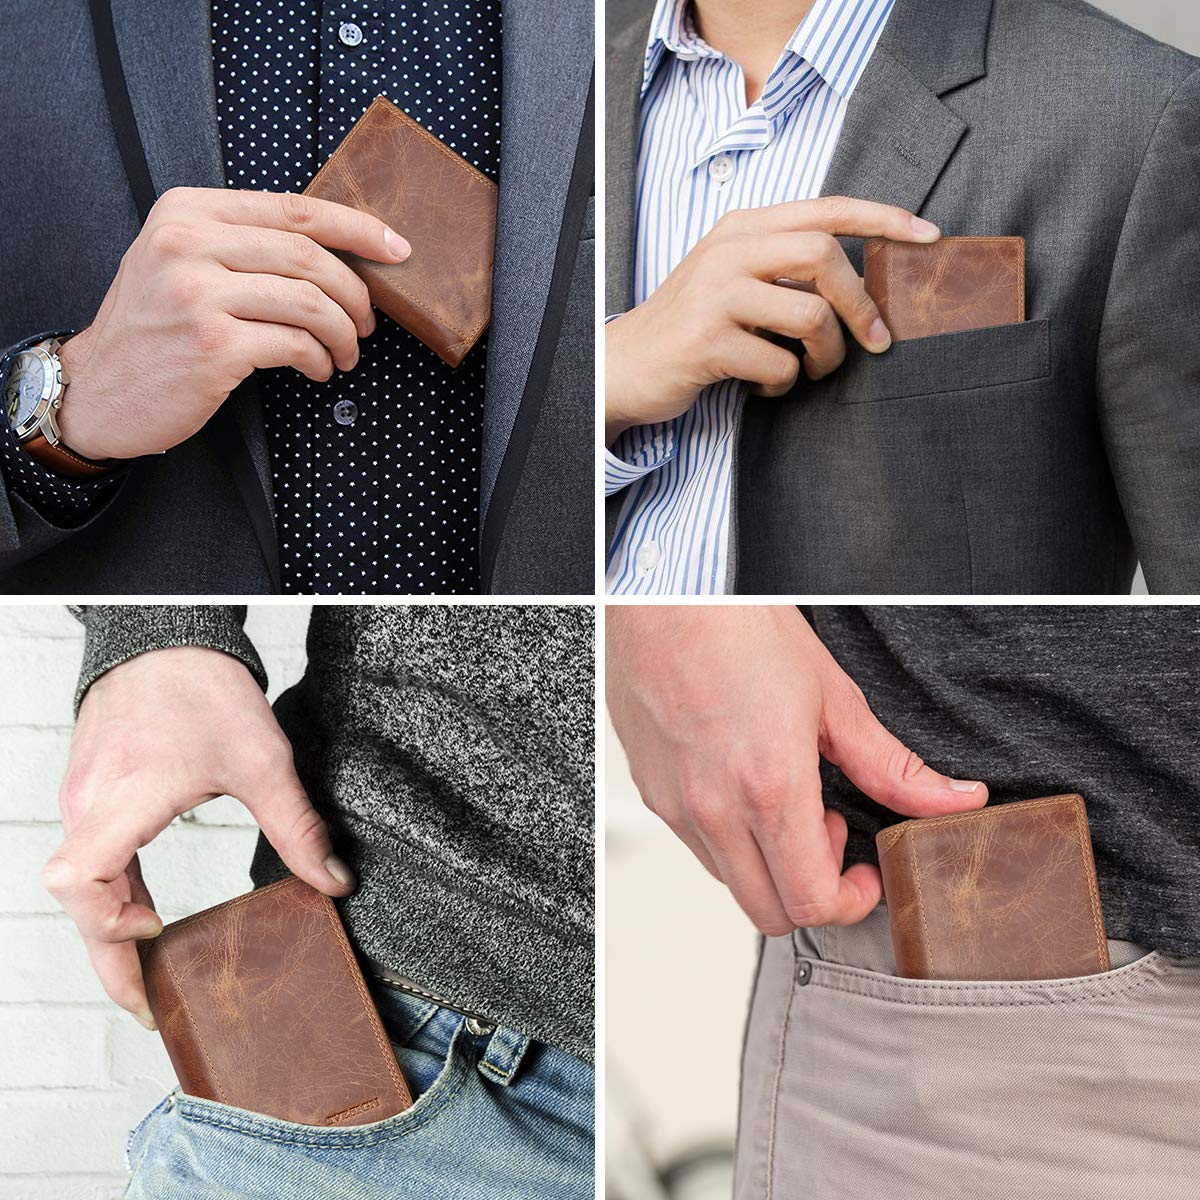 IVESIGN Bifold Travel Wallet RFID Blocking Genuine Leather Credit Card Holder